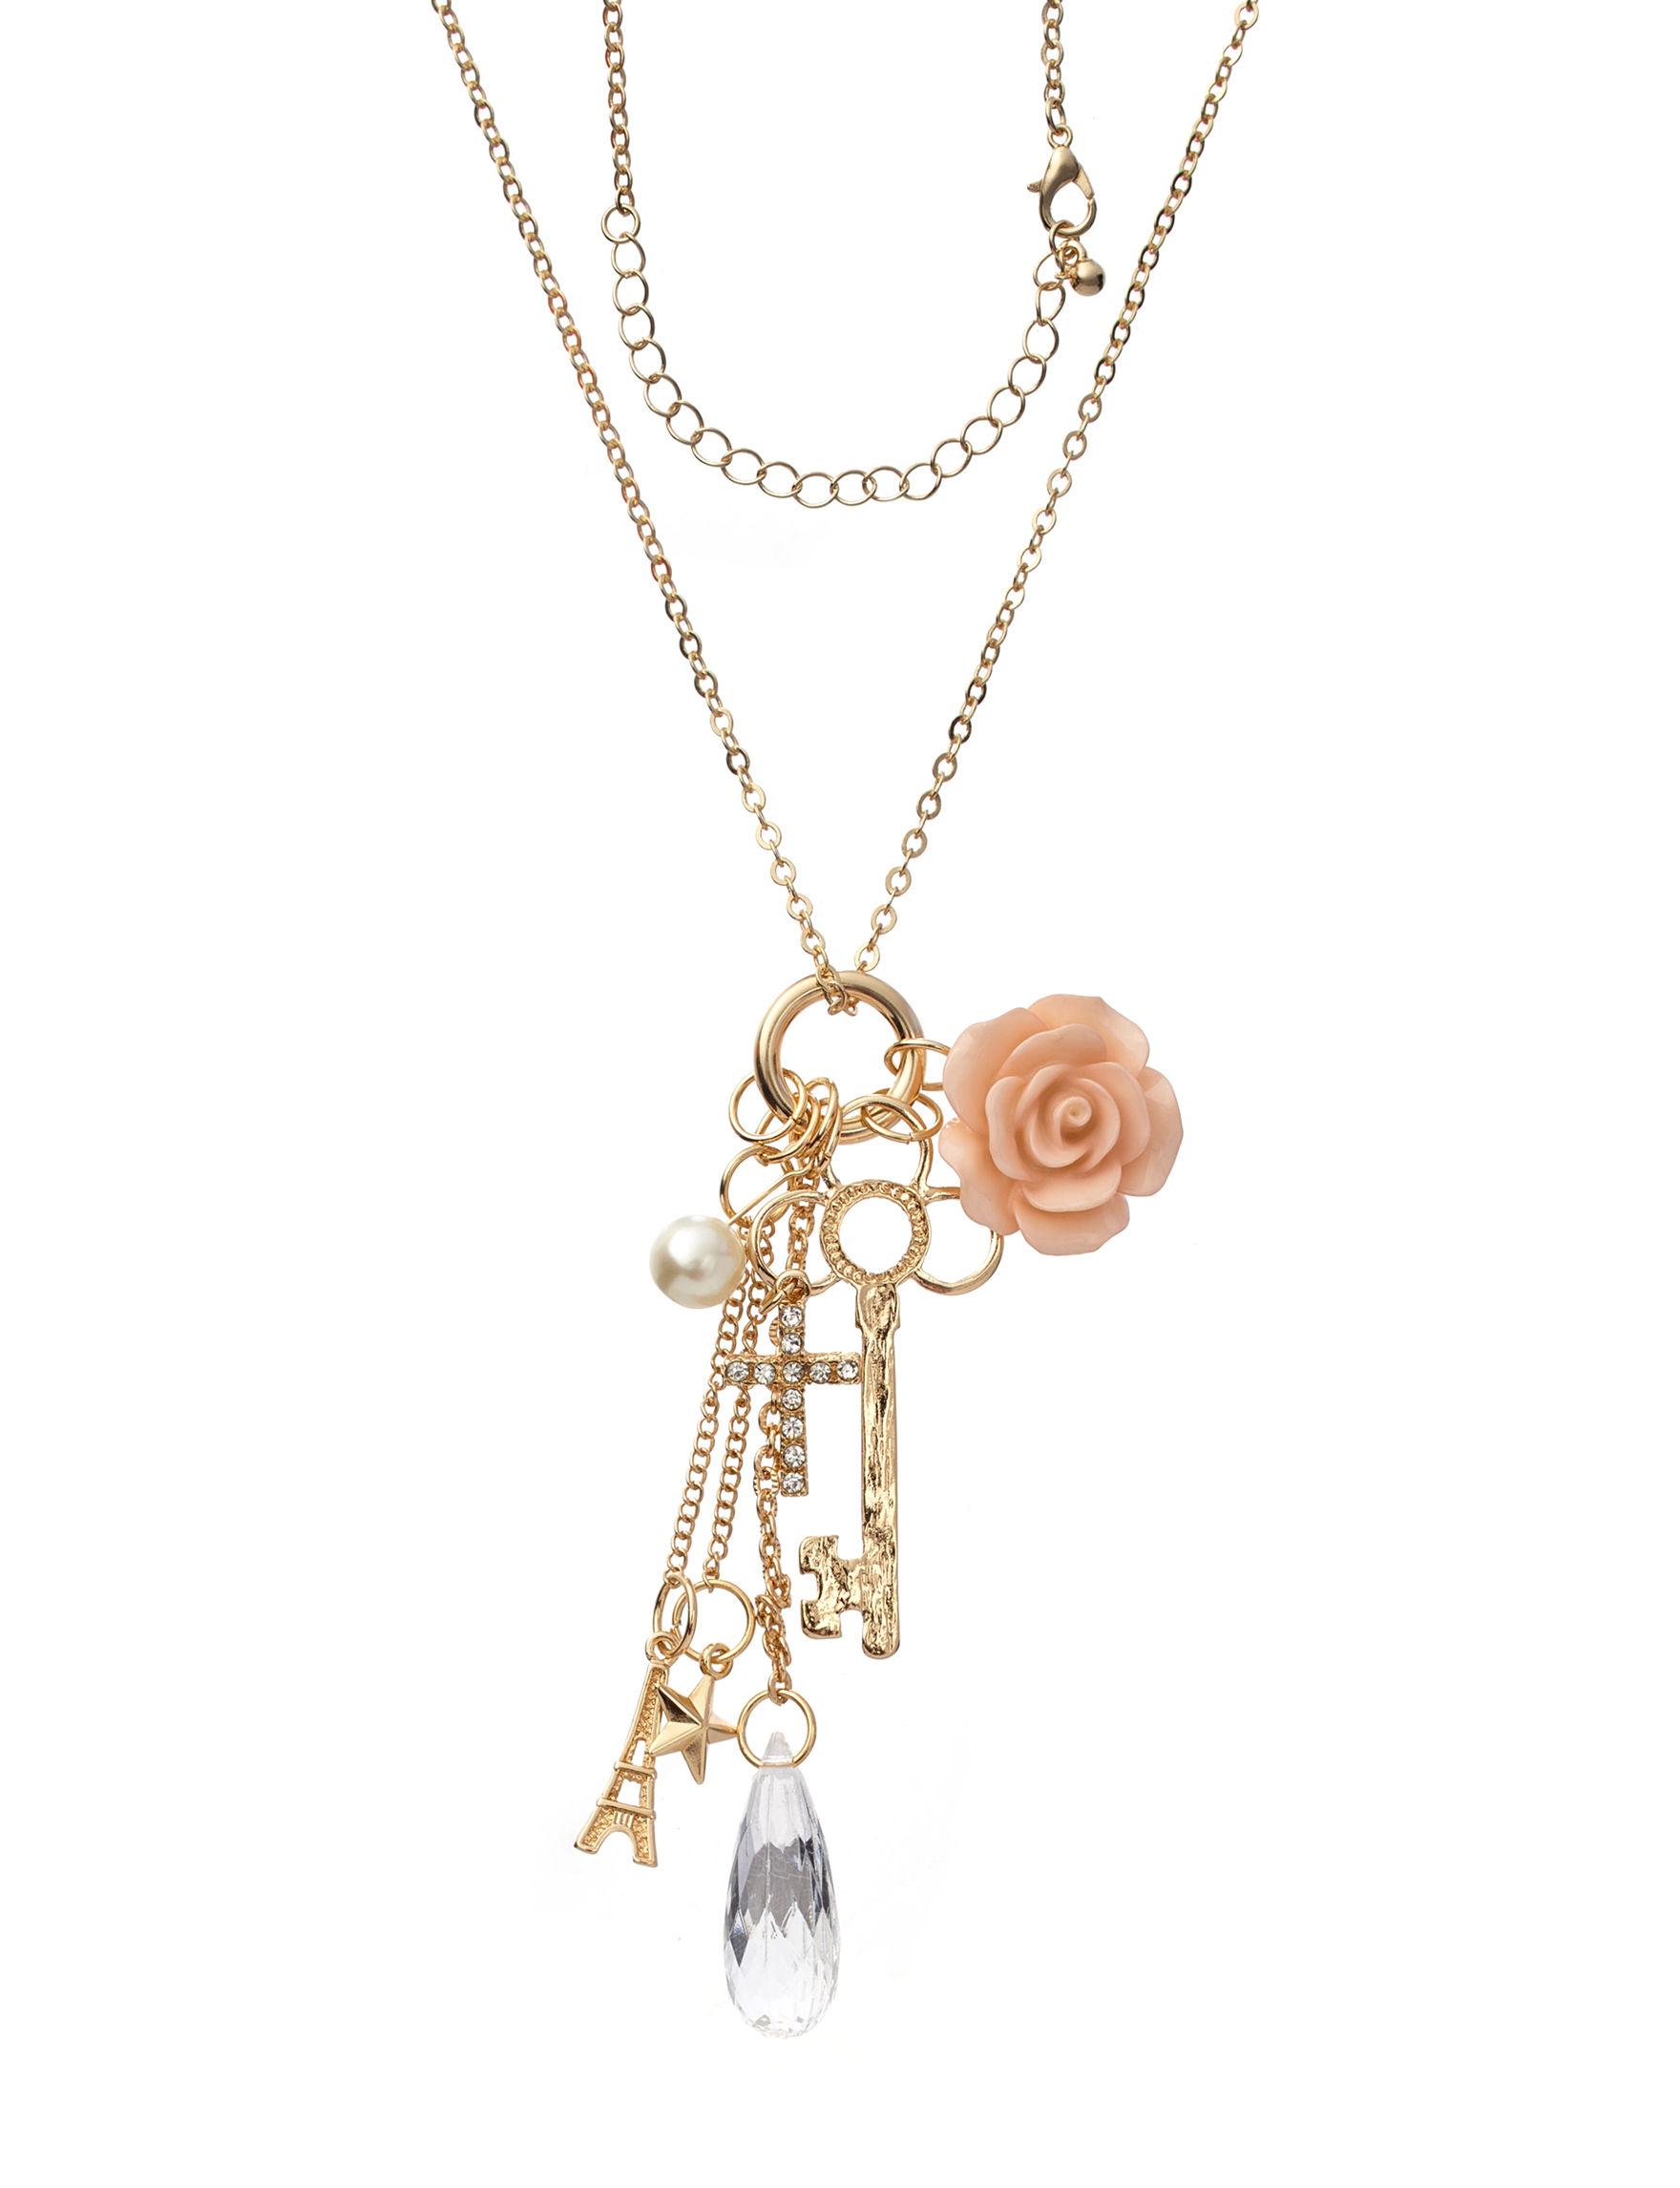 Wishful Park Pink Necklaces & Pendants Fashion Jewelry